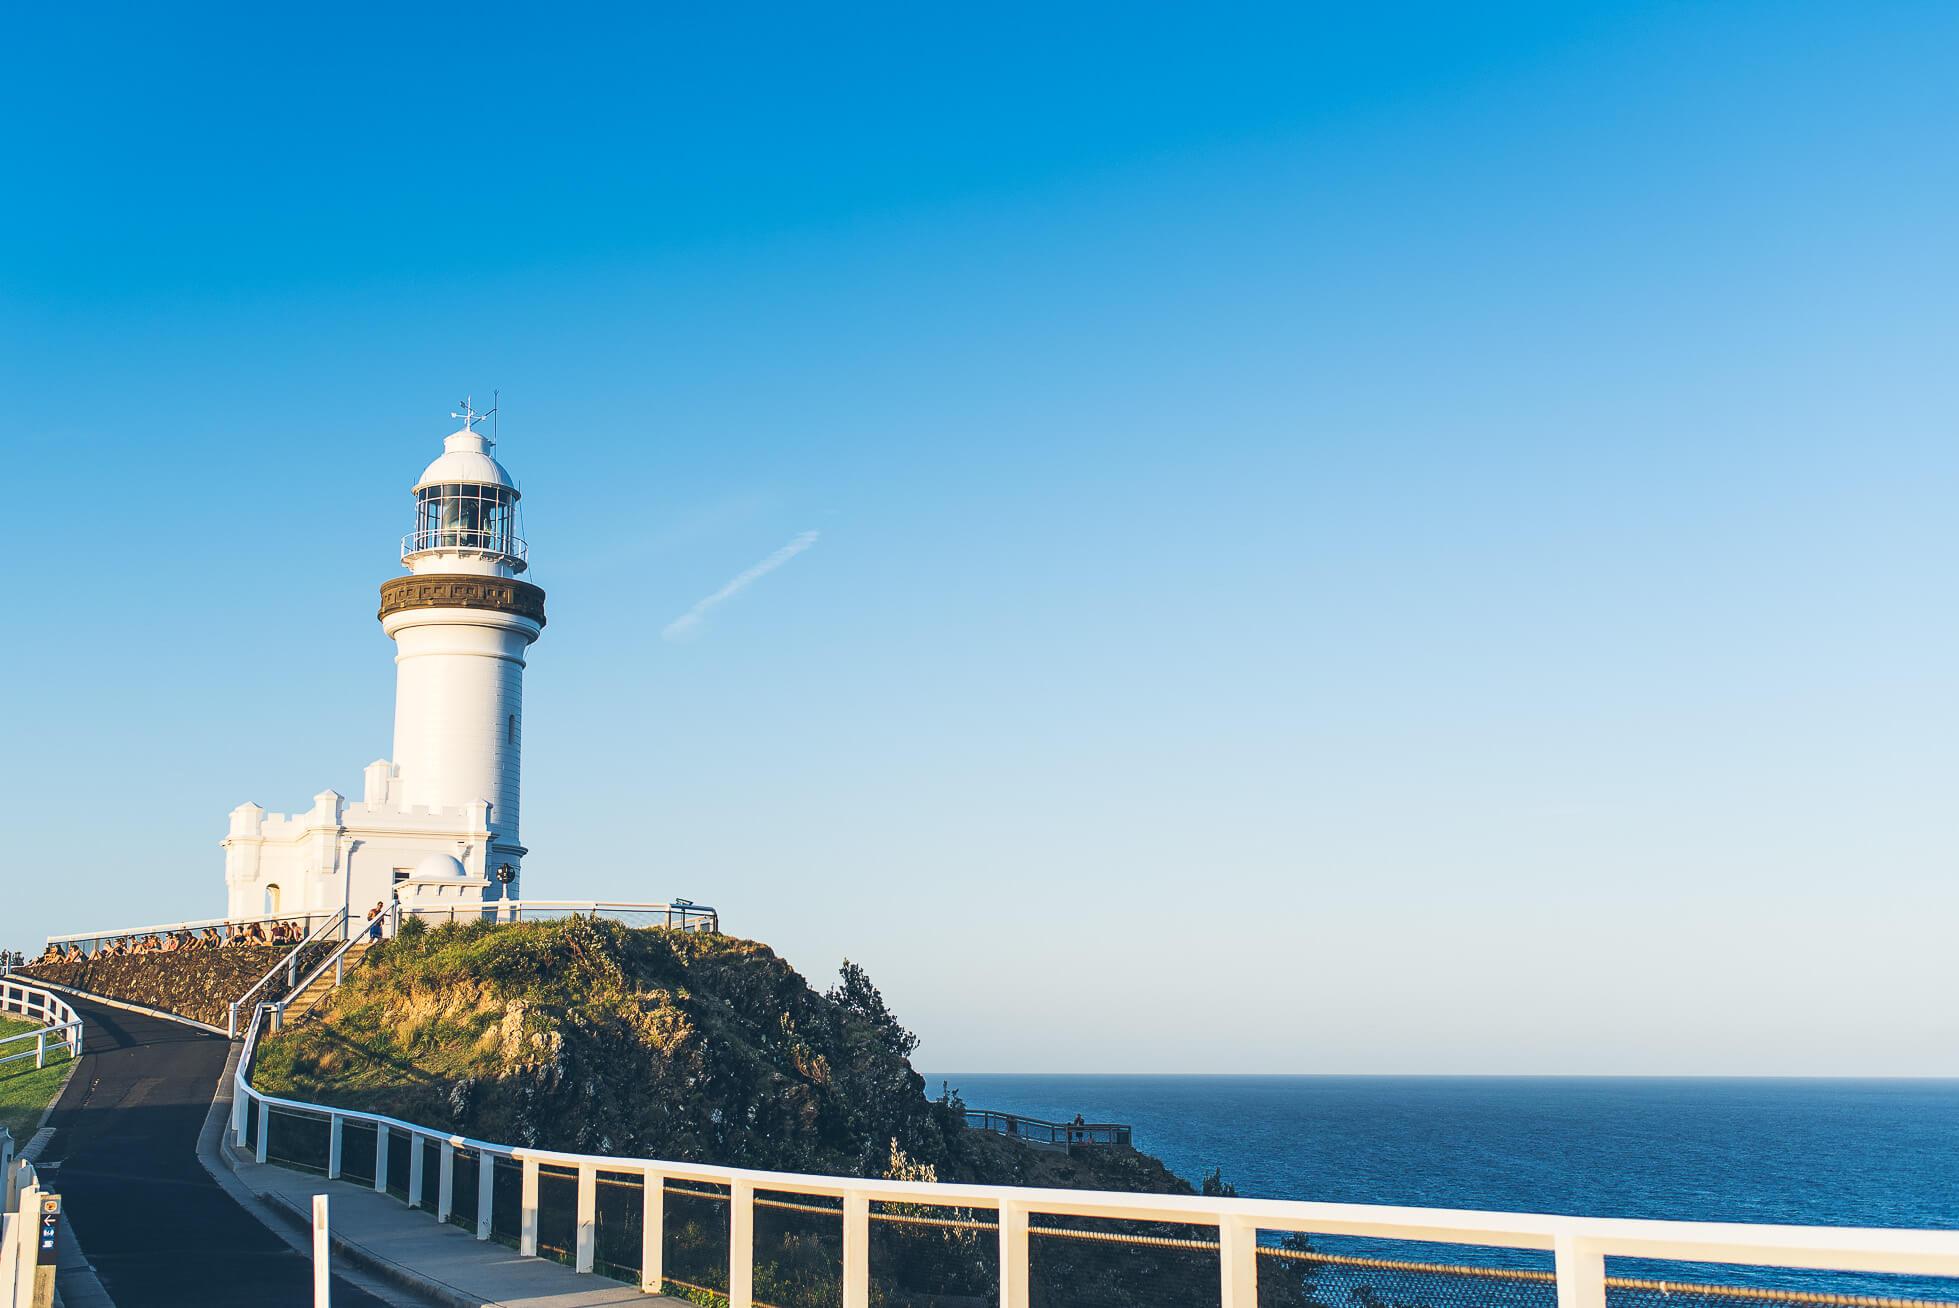 janni-deler-the-lighthouse-byronbayDSC_3879